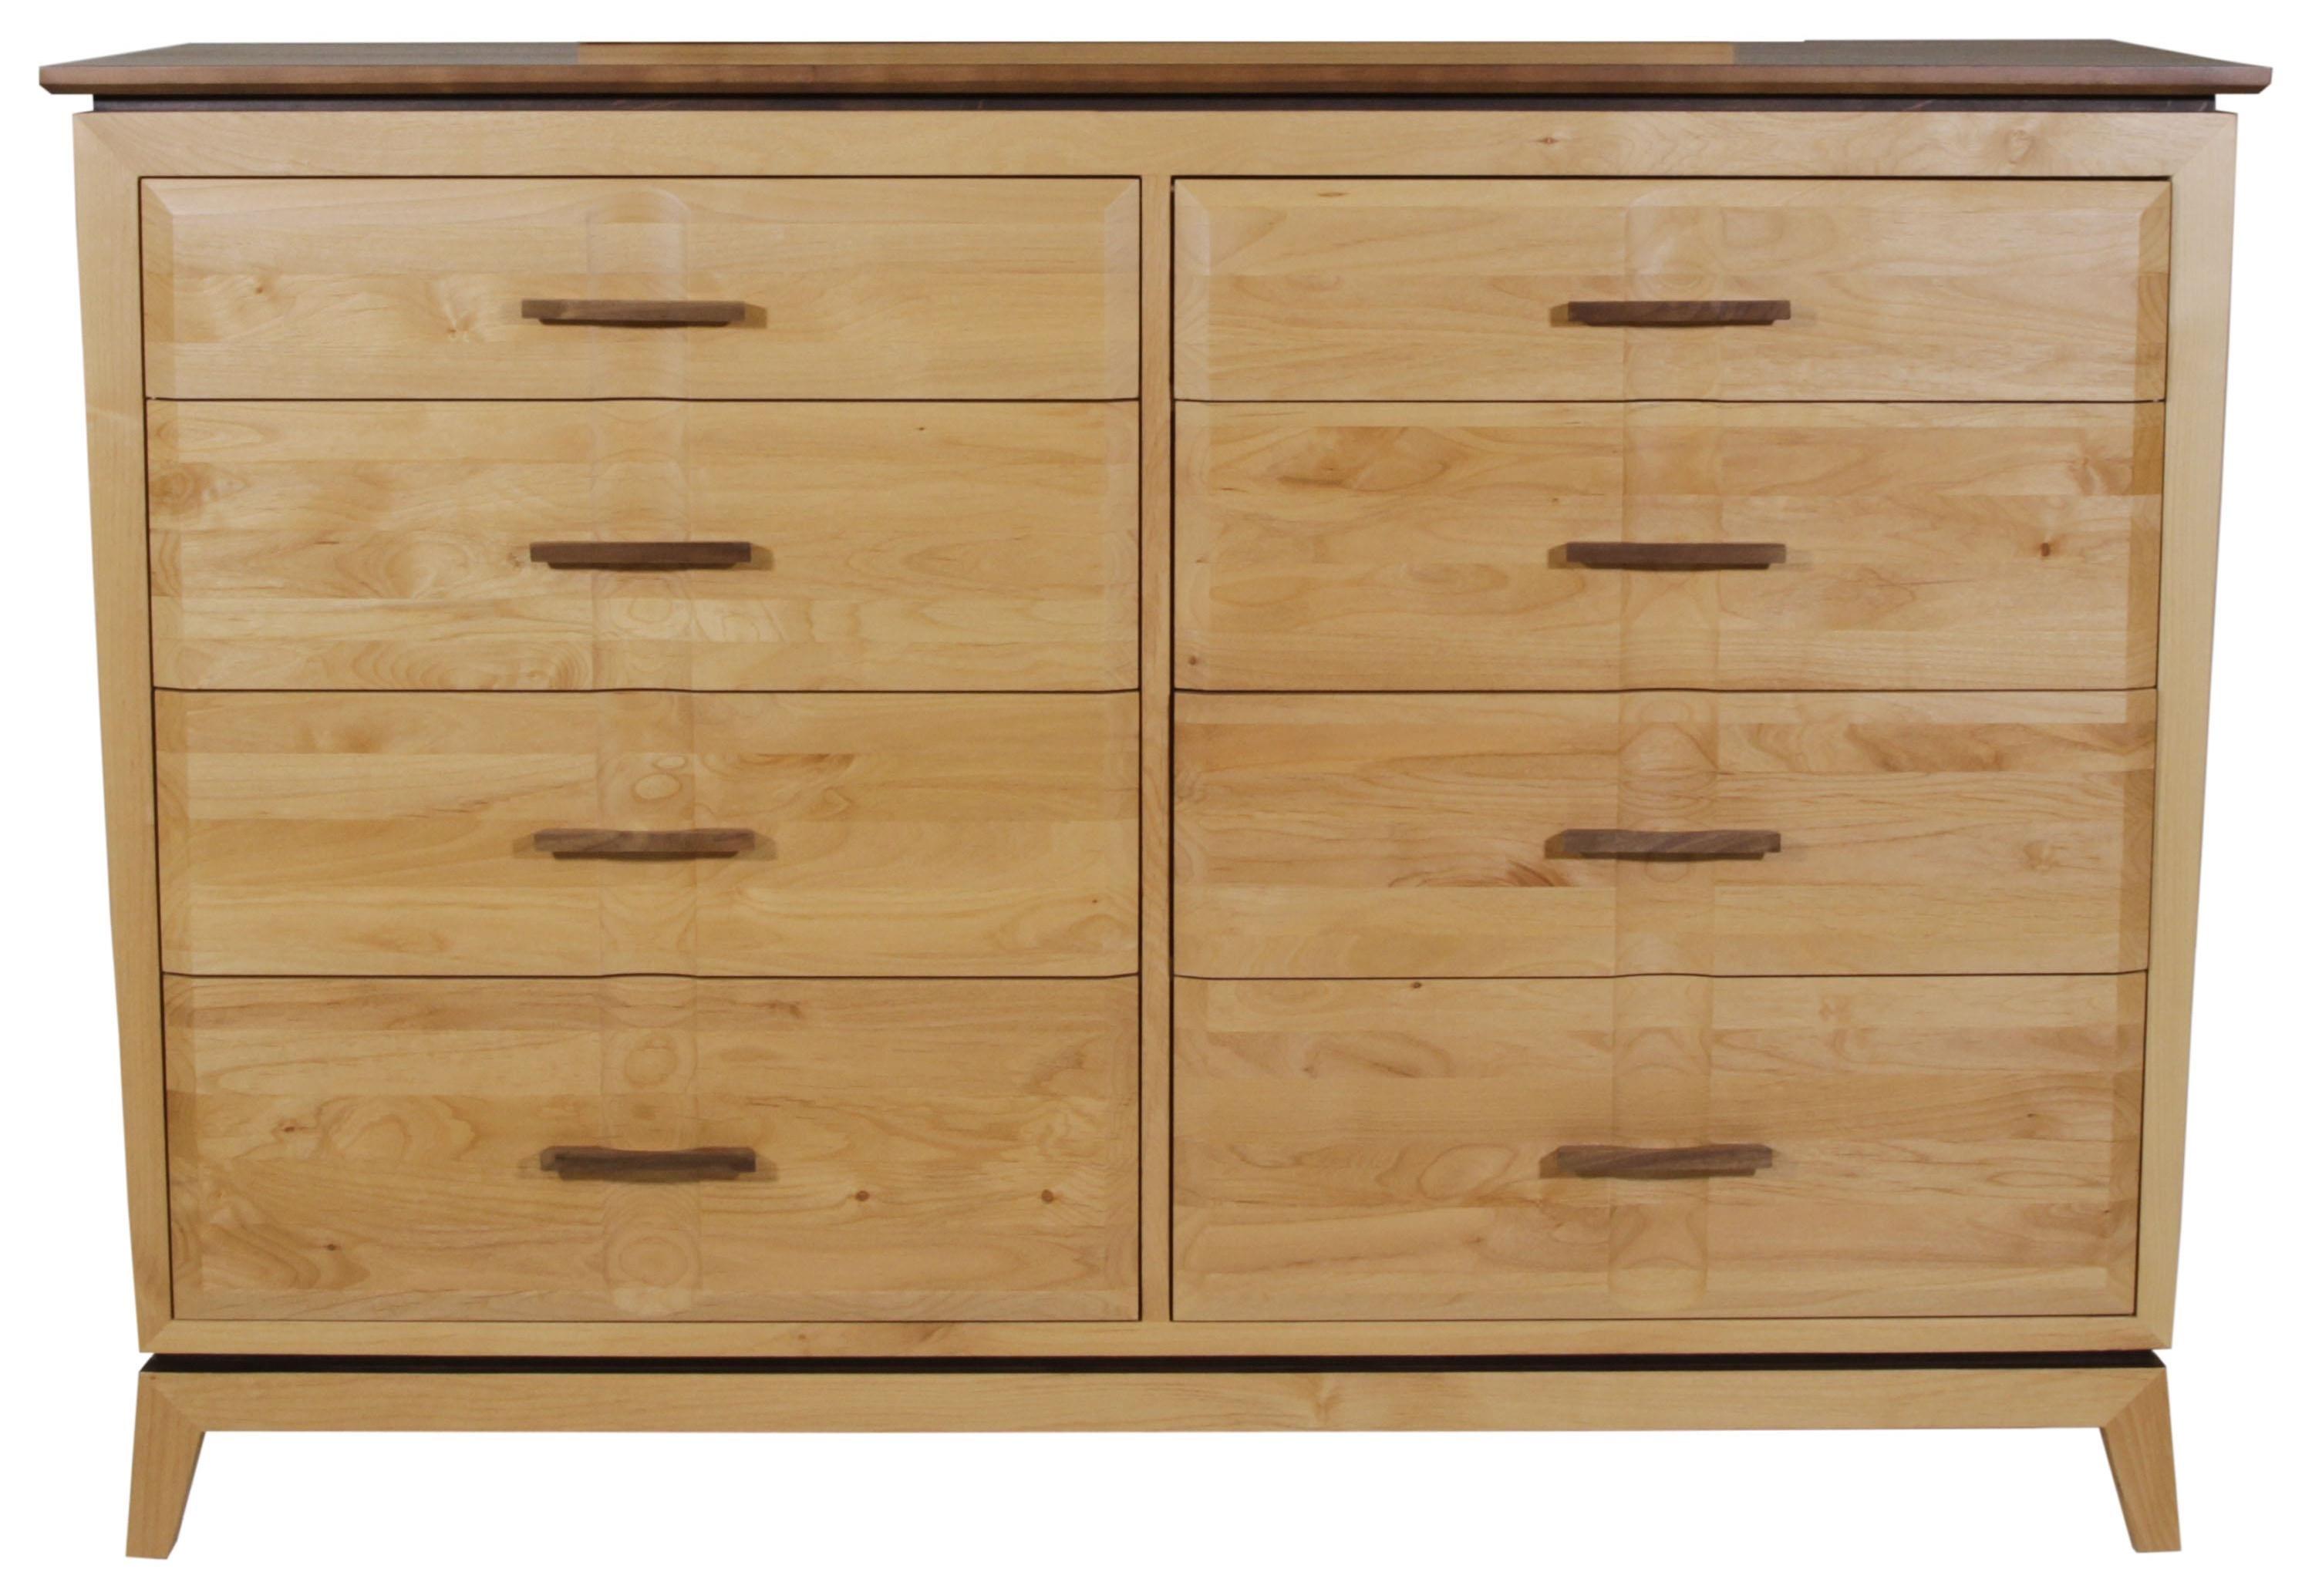 Addison Dresser by Whittier Wood at HomeWorld Furniture